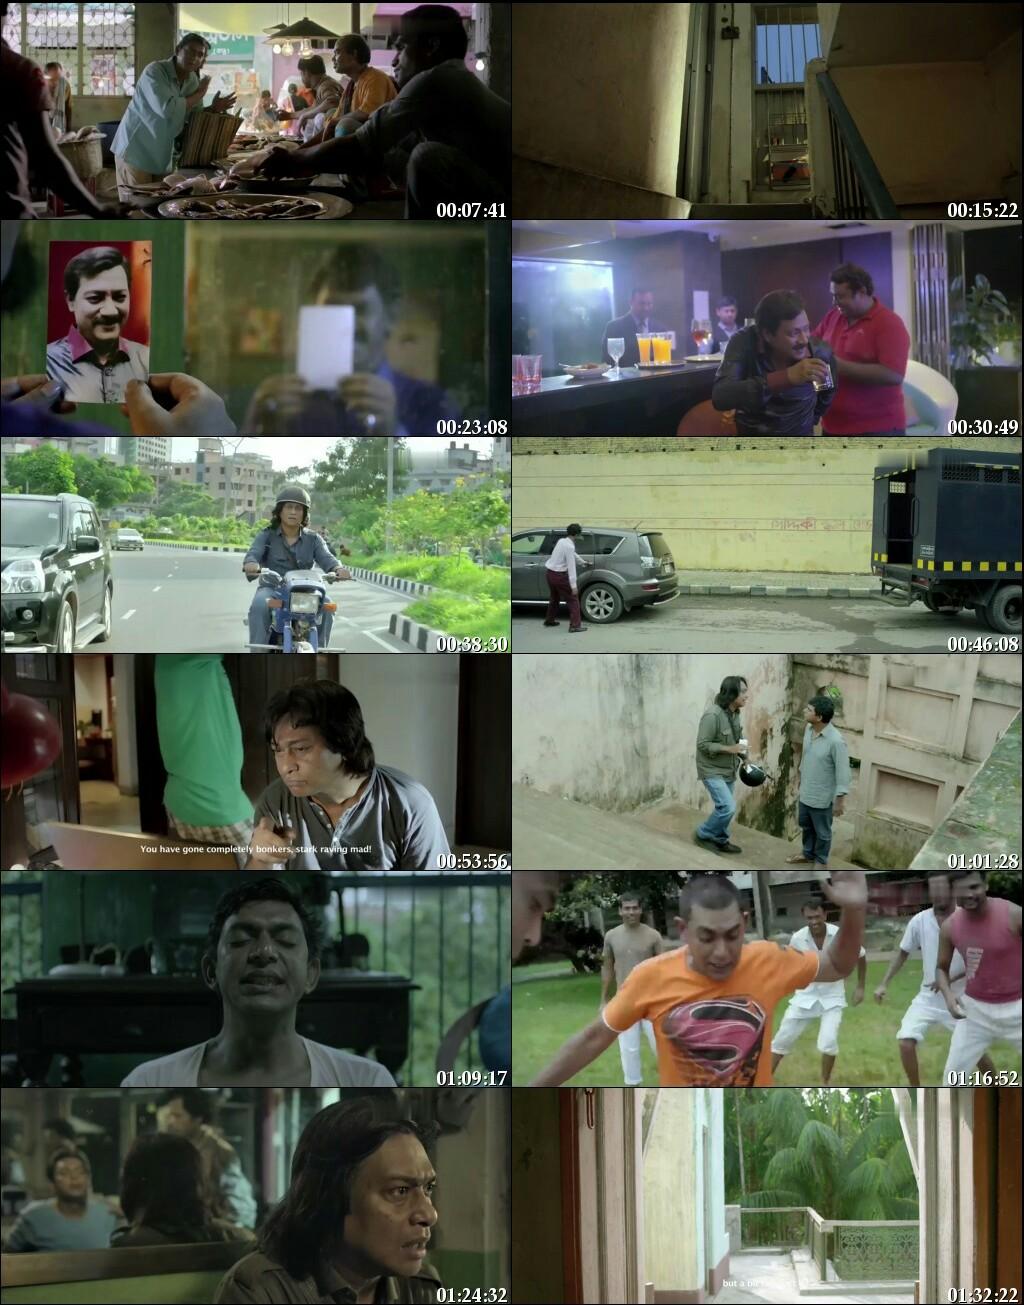 Aynabaji (2016) Full Movie Download Google Drive Link